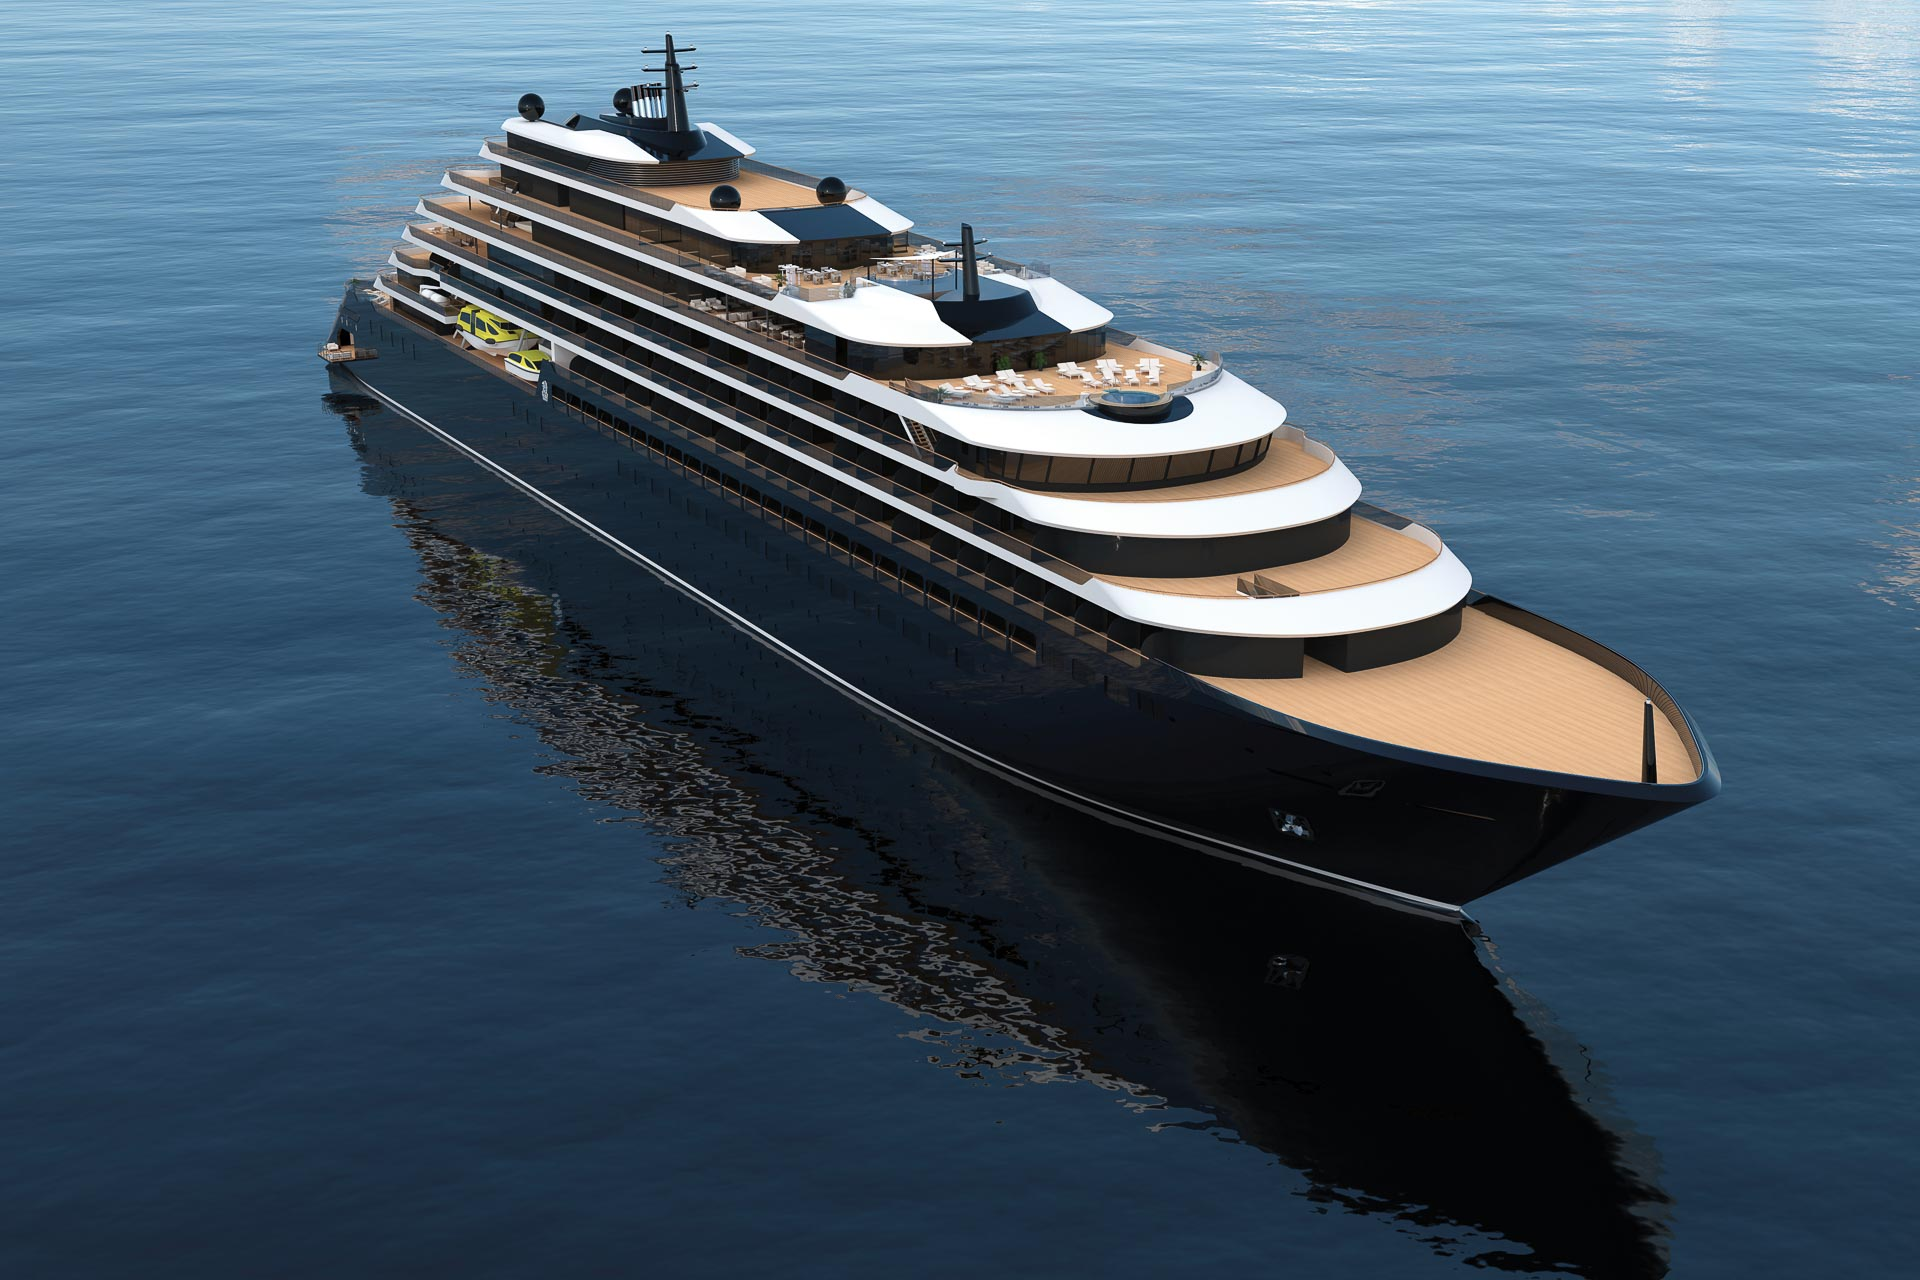 Un aperçu (rendu 3D) du premier navire de The Ritz-Carlton Yacht Collection © Ritz-Carlton